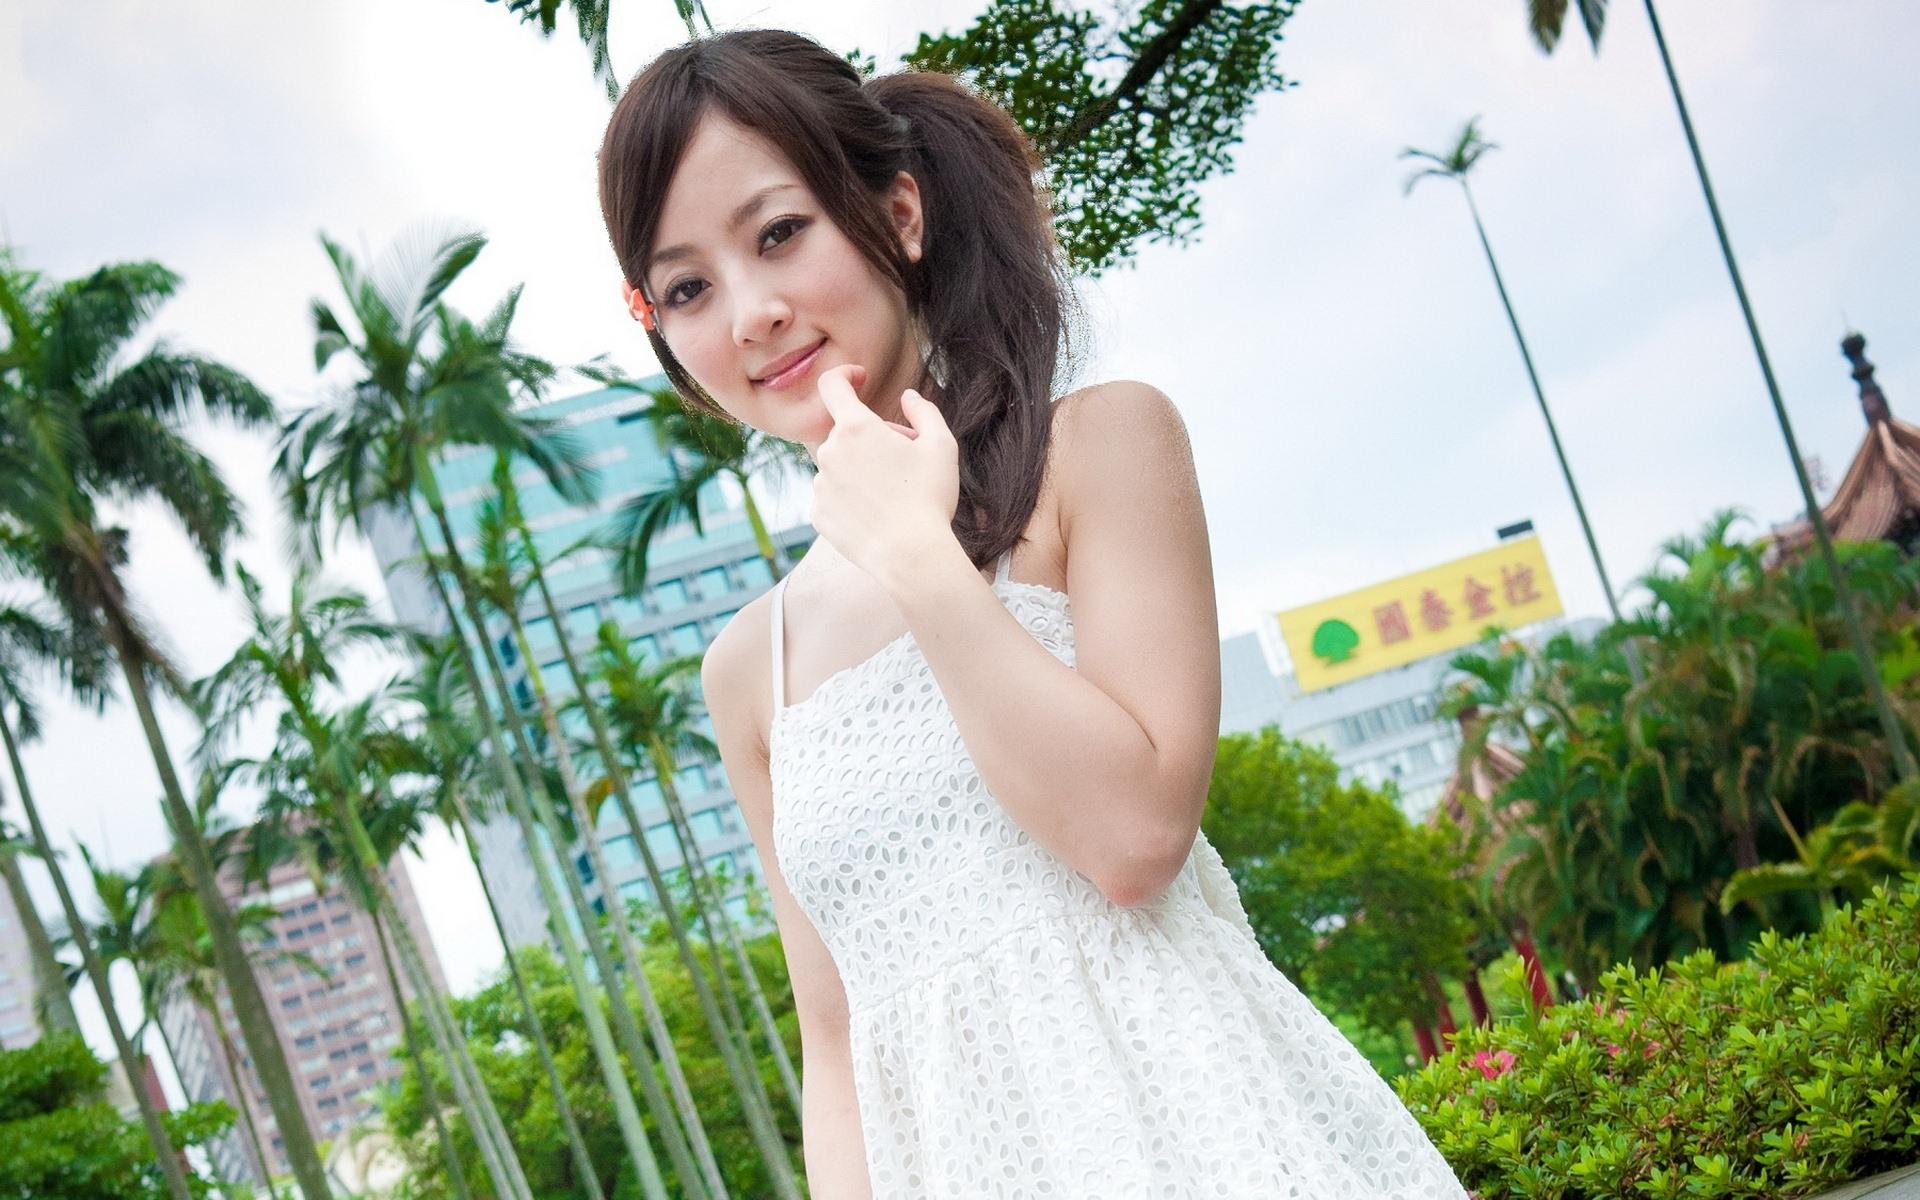 taiwan beaufiful girl mikako - photo #13